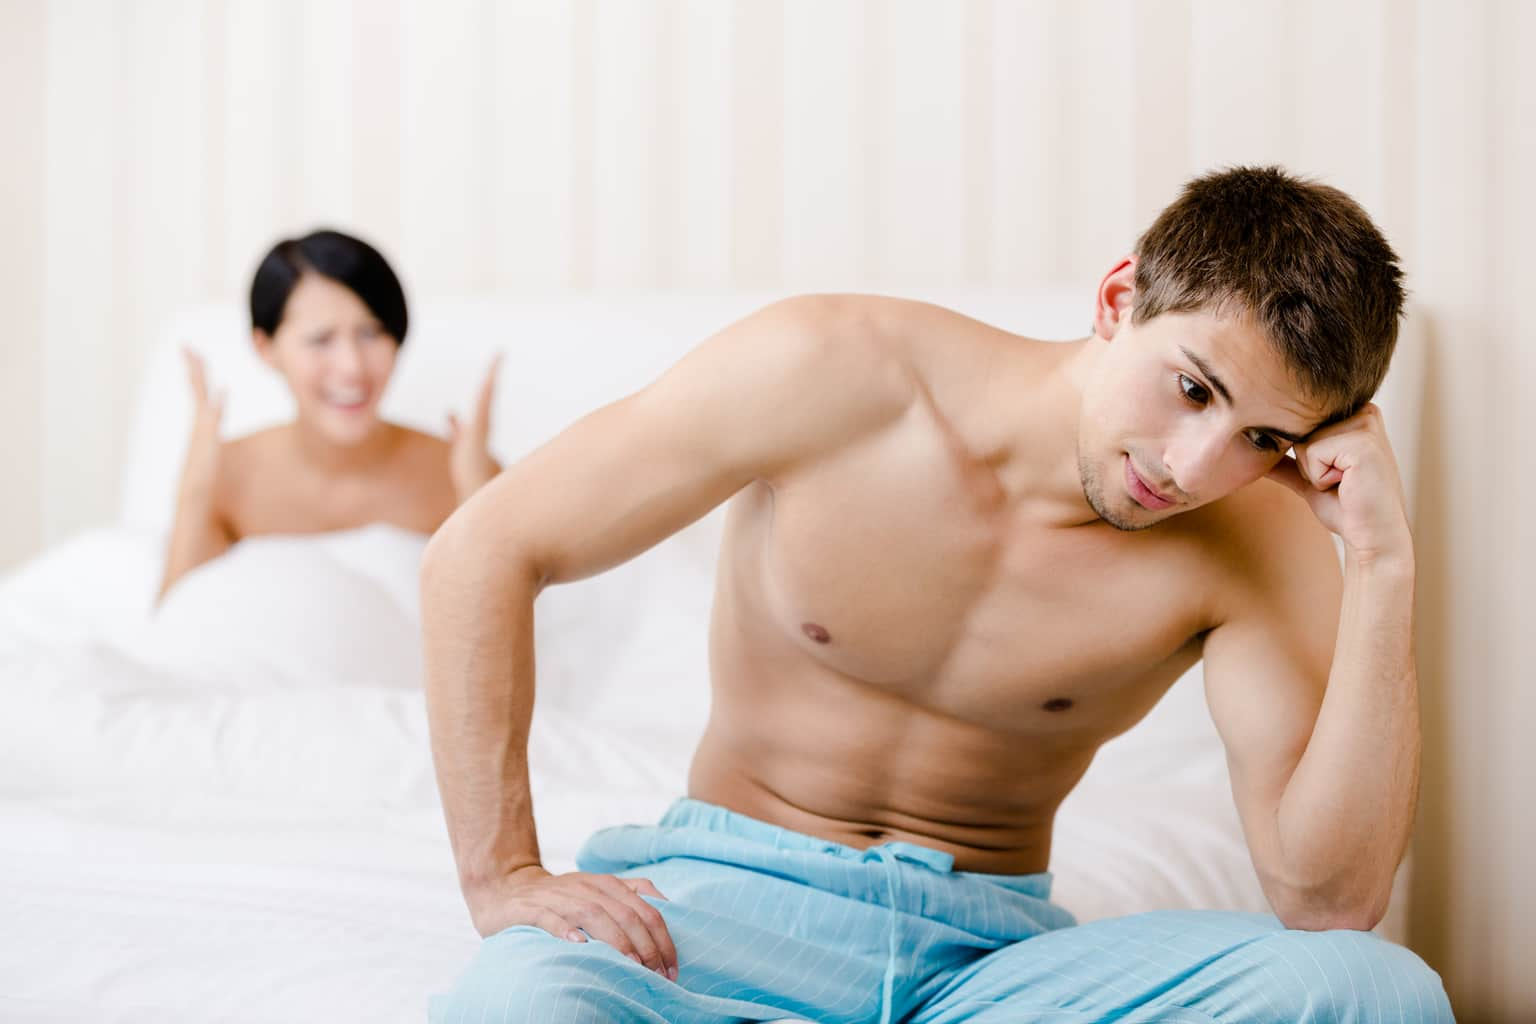 Estrogen causes prostate inflammation